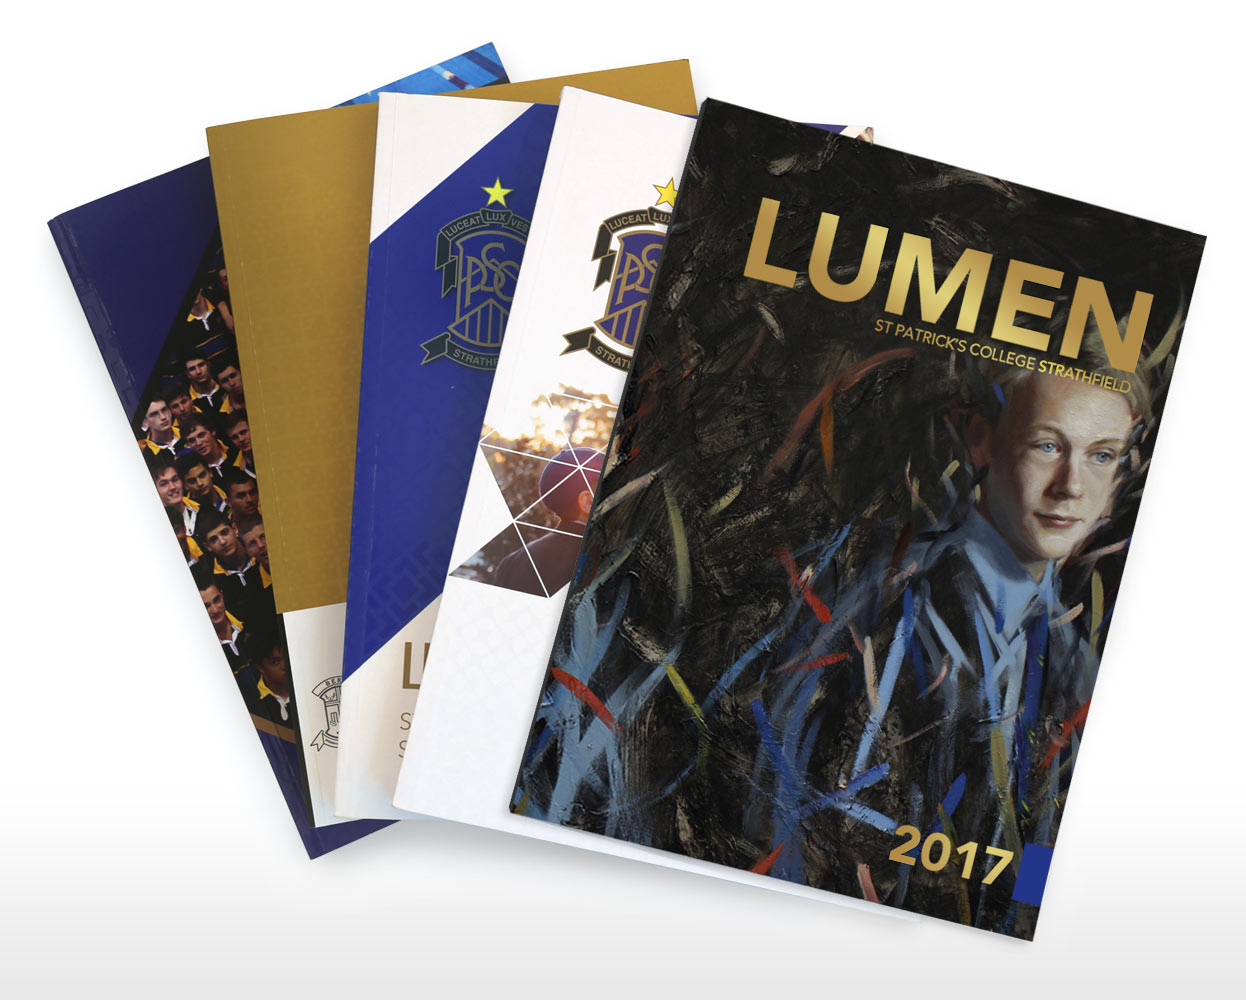 St Patricks College Lumen Branding Year Book 2017 Cover